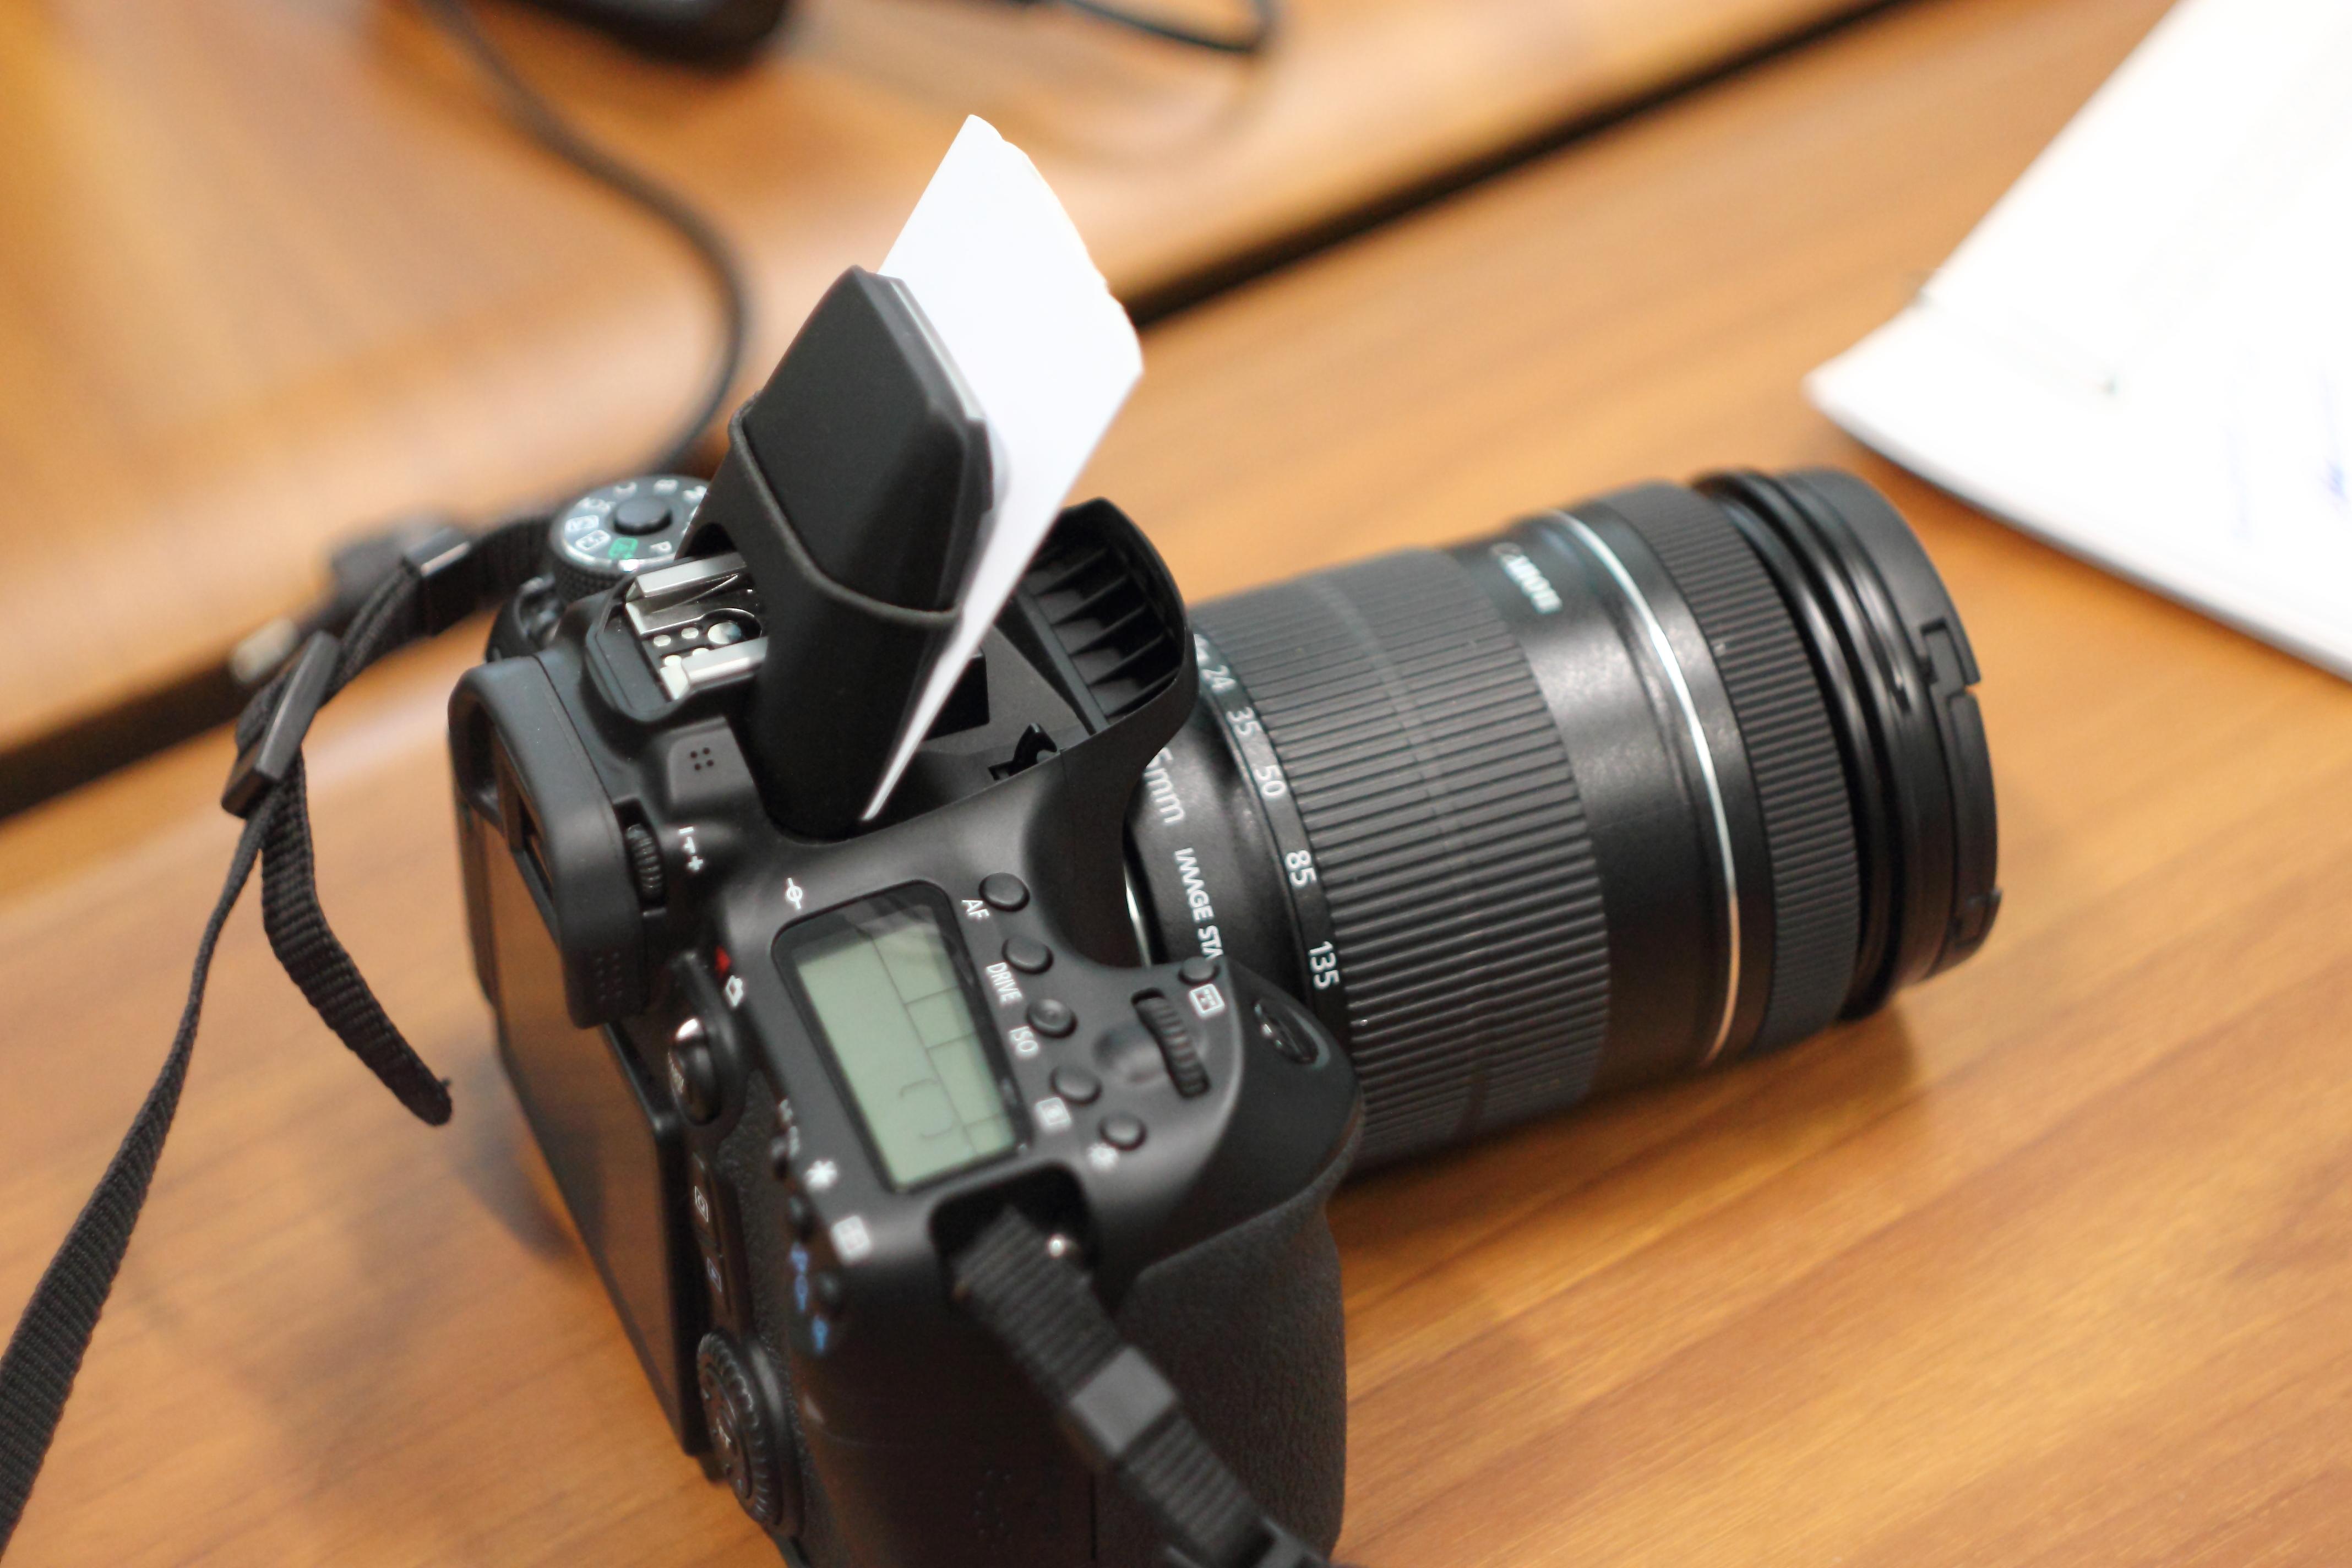 Софтбокс для фотоаппарата своими руками 10